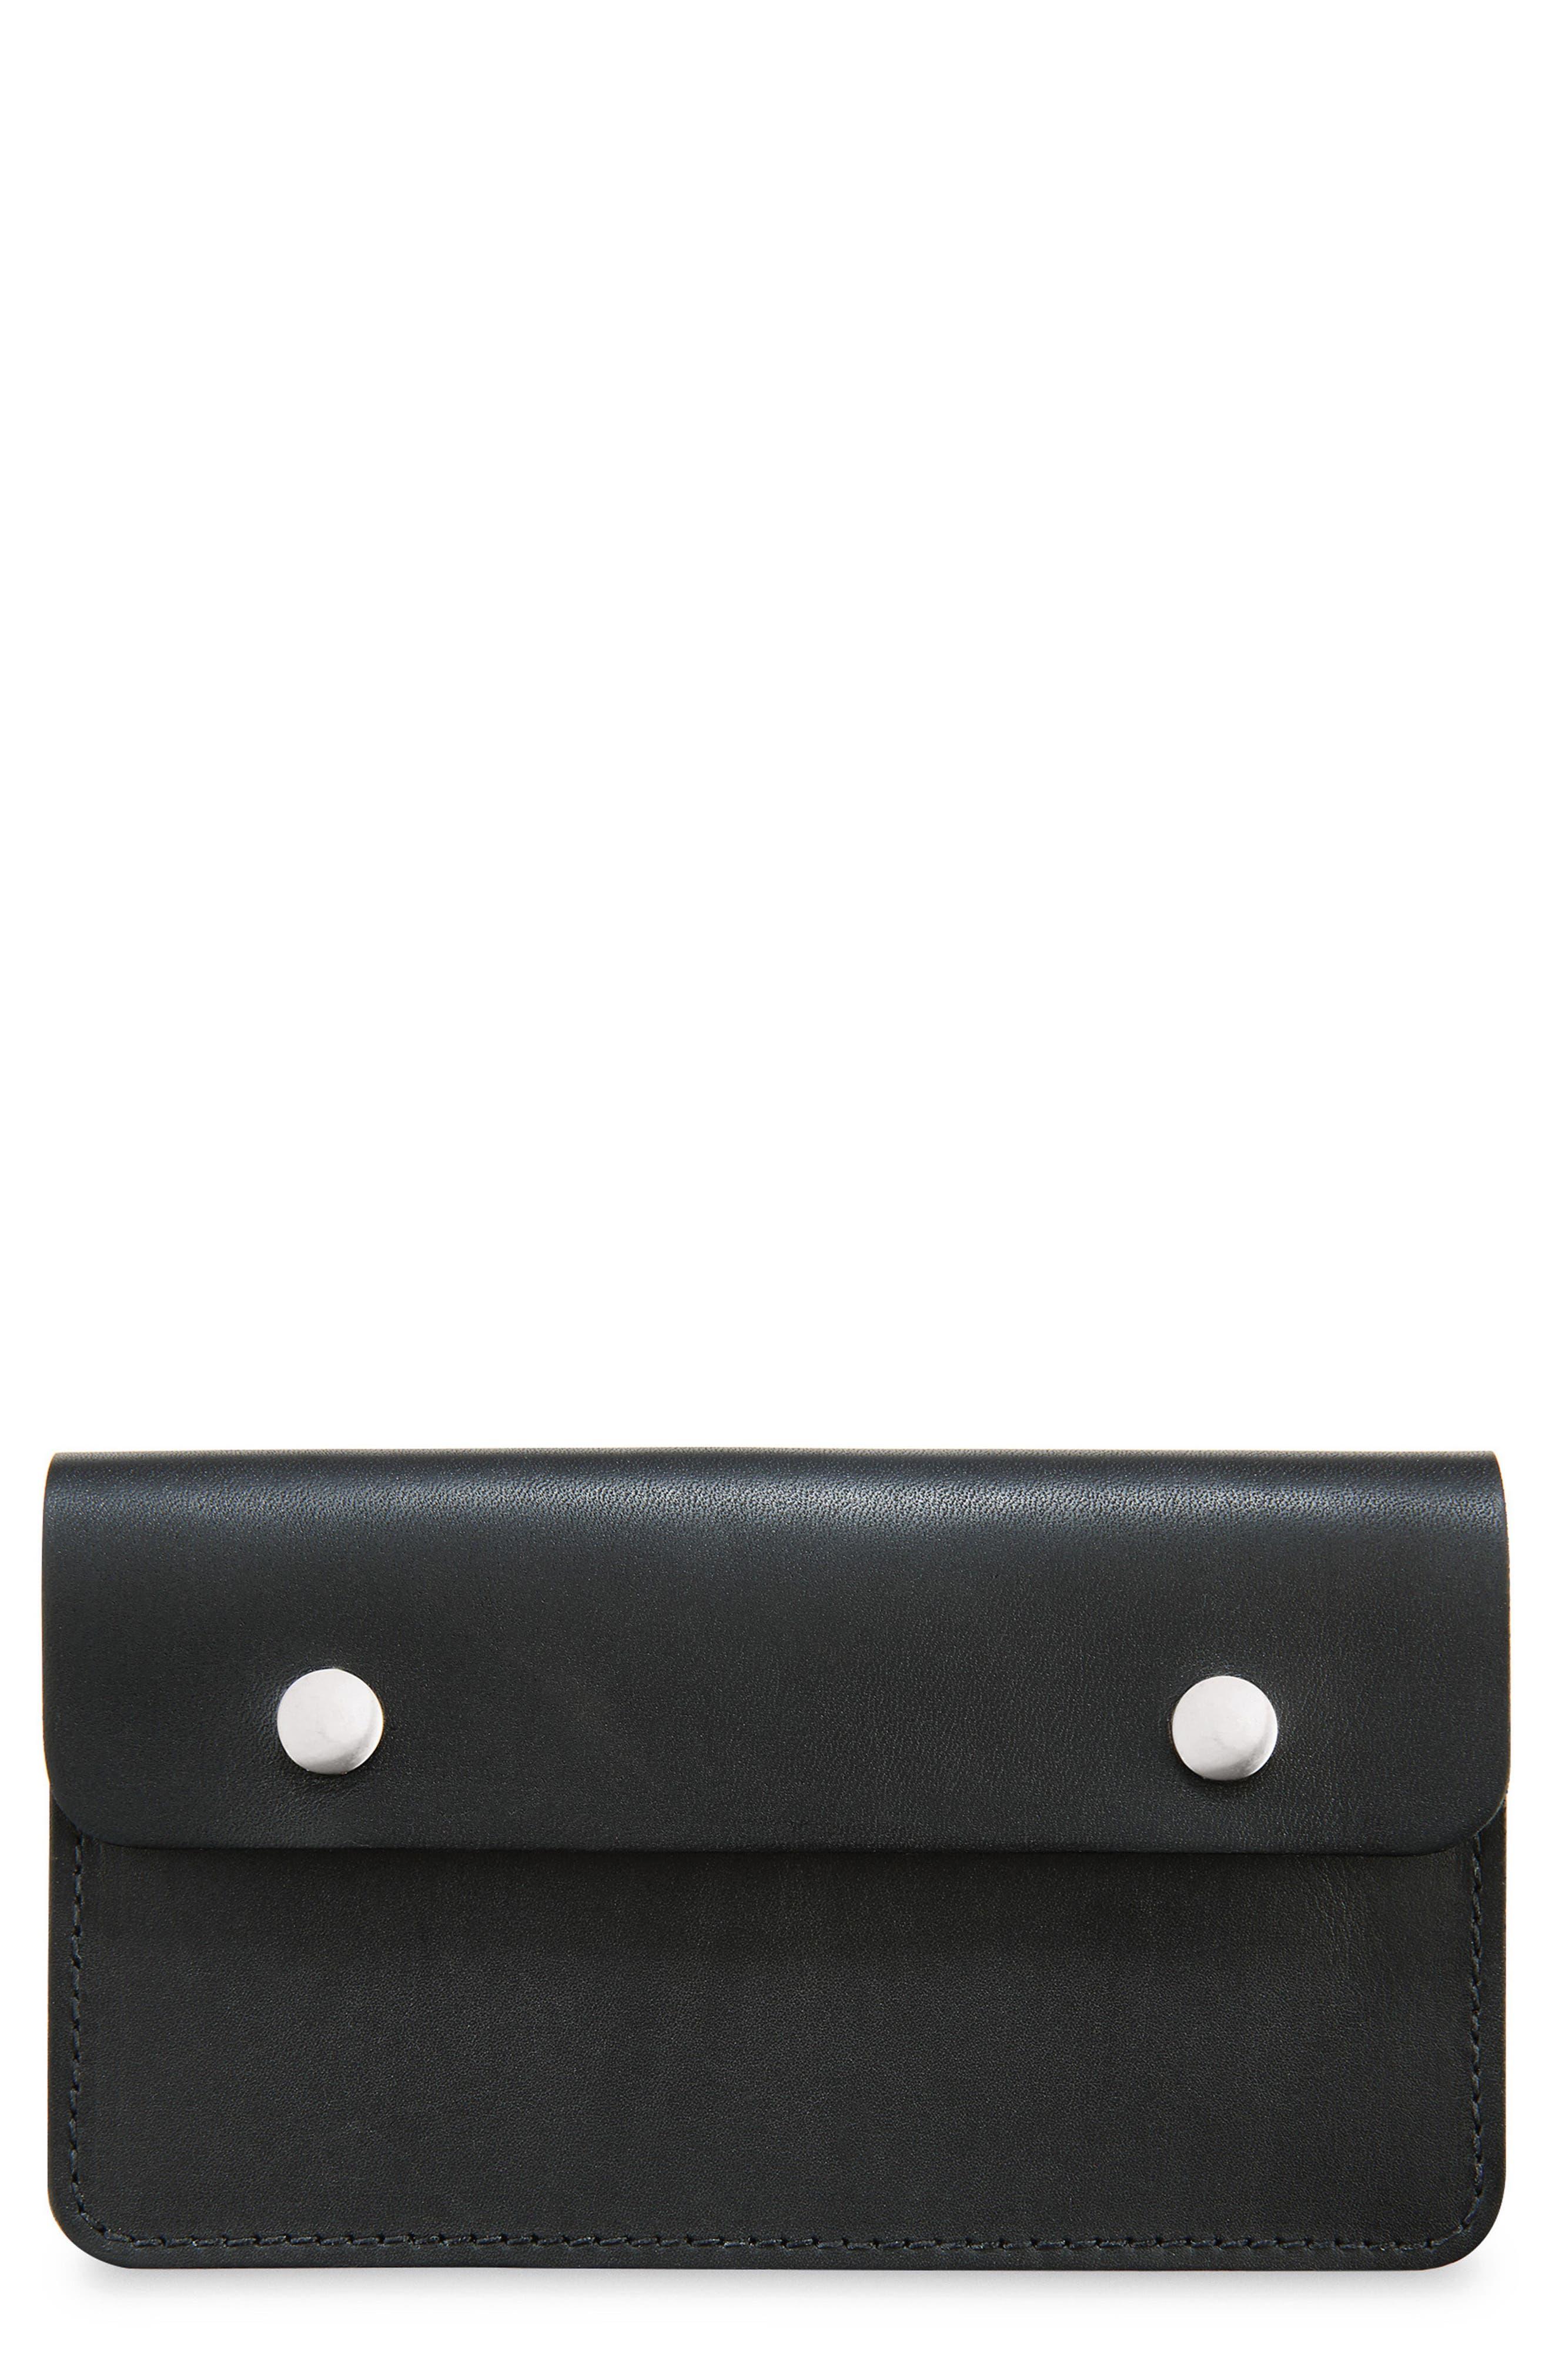 Leather Trucker Wallet,                             Main thumbnail 1, color,                             BLACK